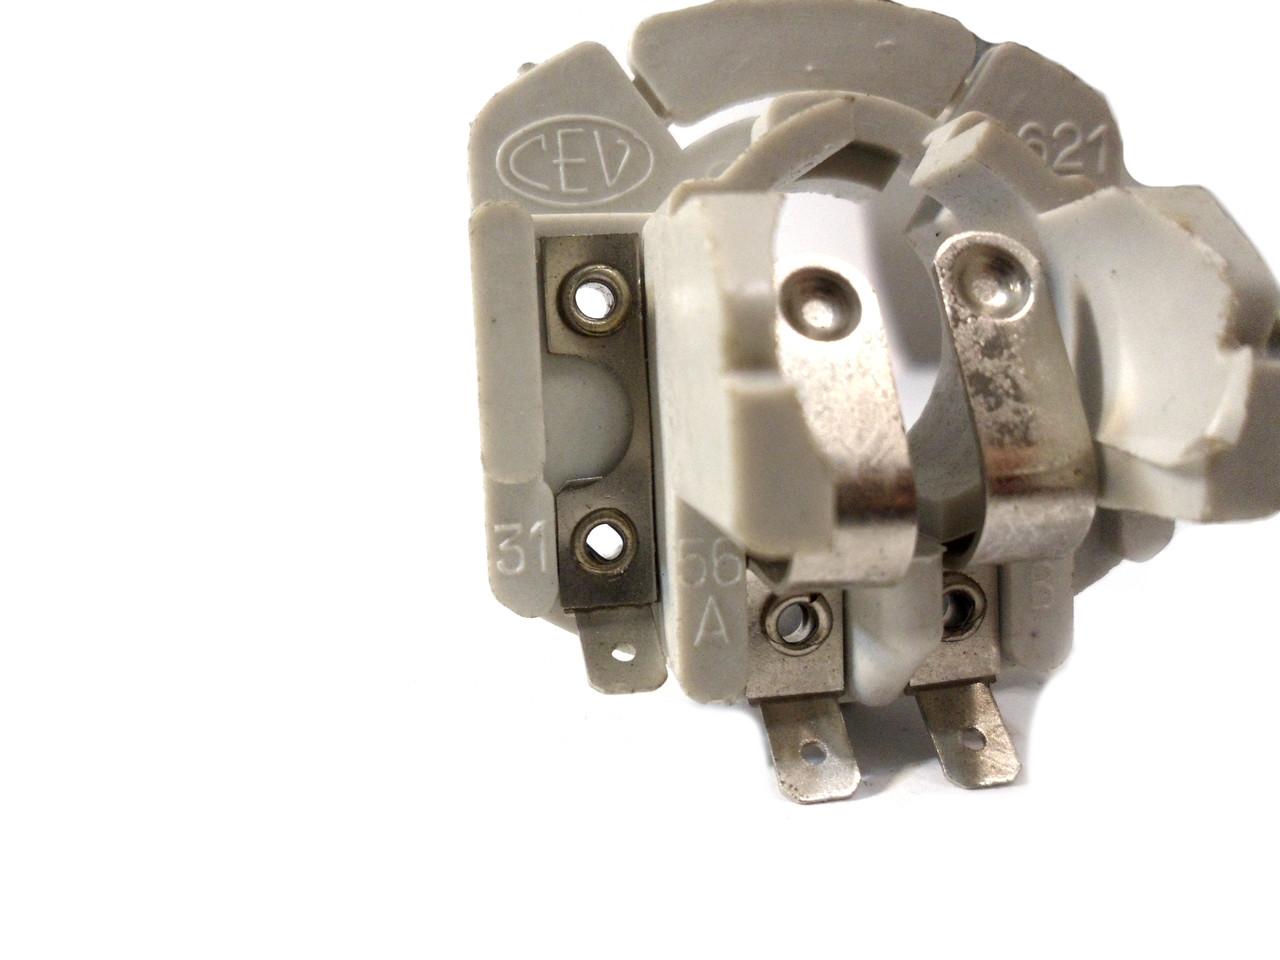 NOS CEV BA20D Moped Headlight Bulb Holder / Socket - 3 Prong